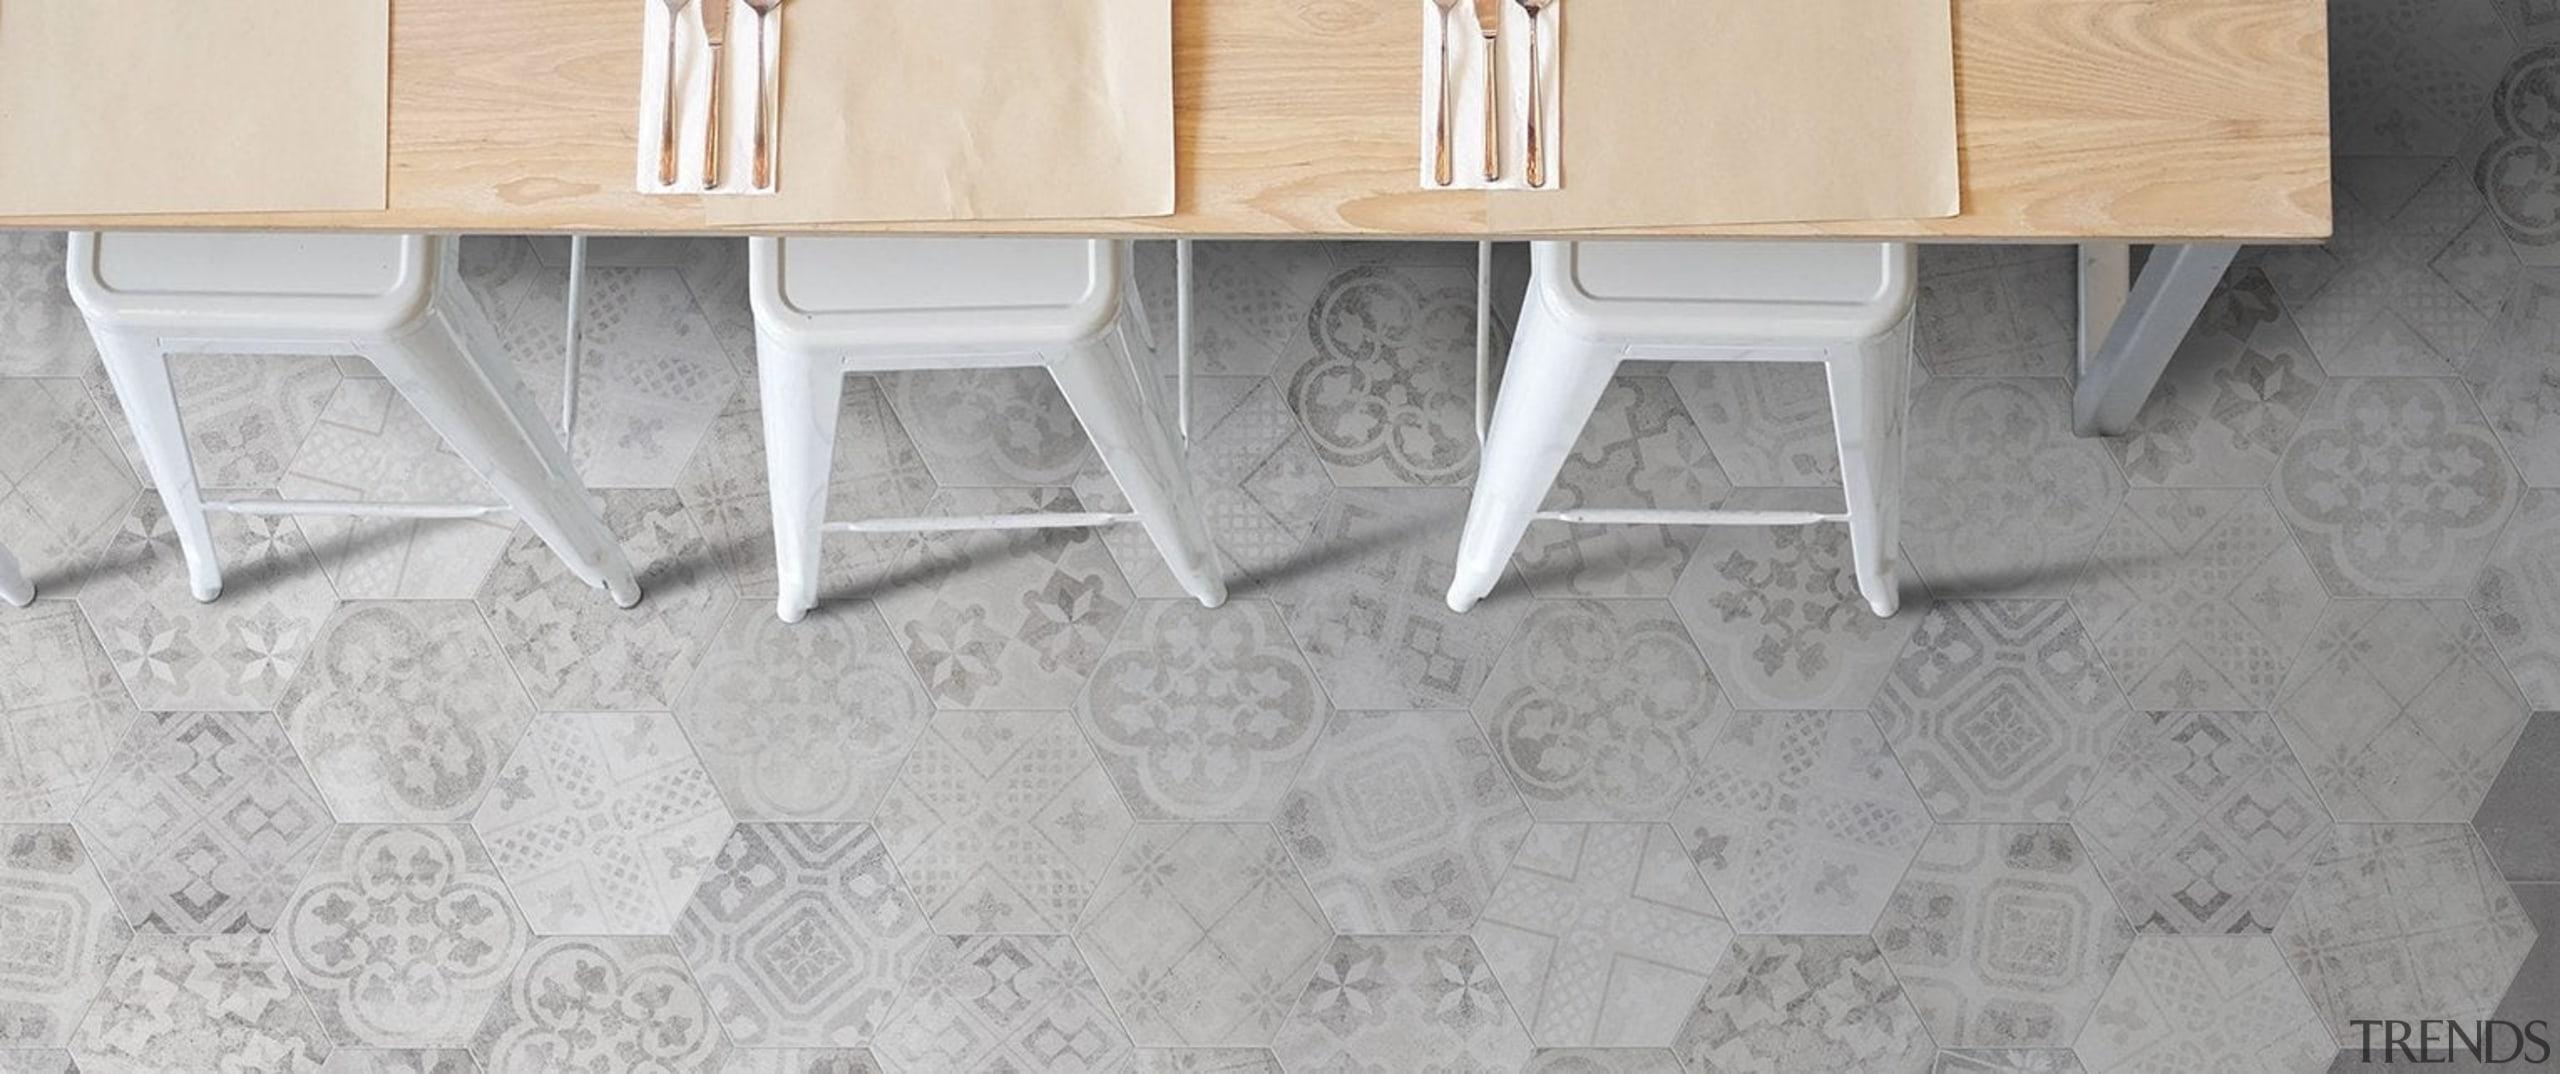 Beton Axis Hexagona Deco Mix 210x182 - Beton floor, flooring, furniture, table, tile, wall, wood, gray